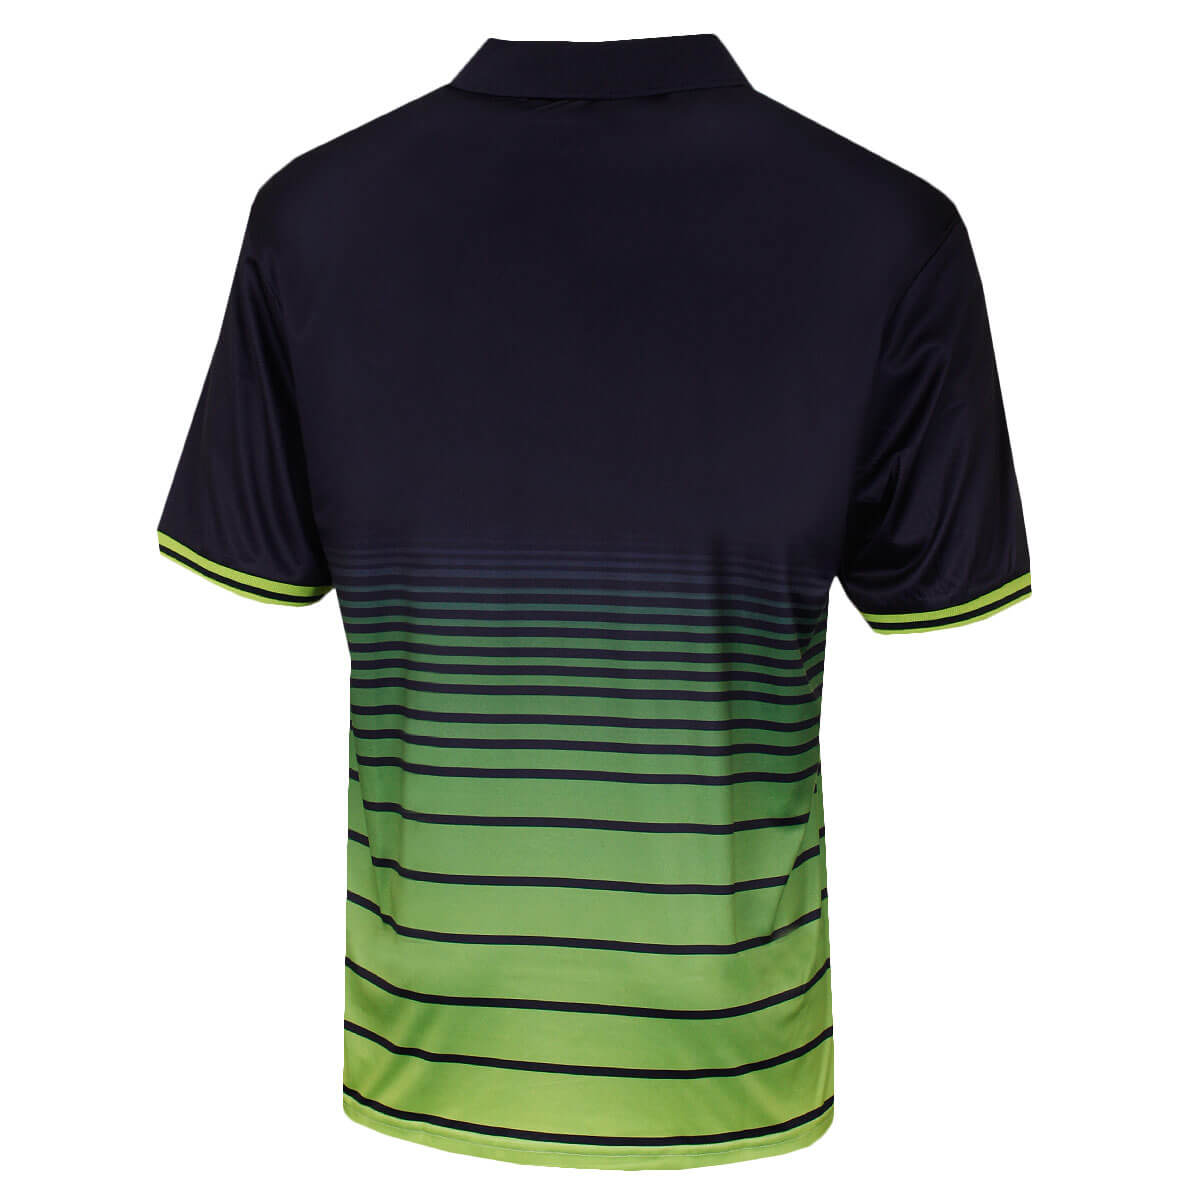 Island-Green-Mens-2019-Golf-1890-Sublimated-Stripe-Logo-Polo-Shirt-43-OFF-RRP thumbnail 7